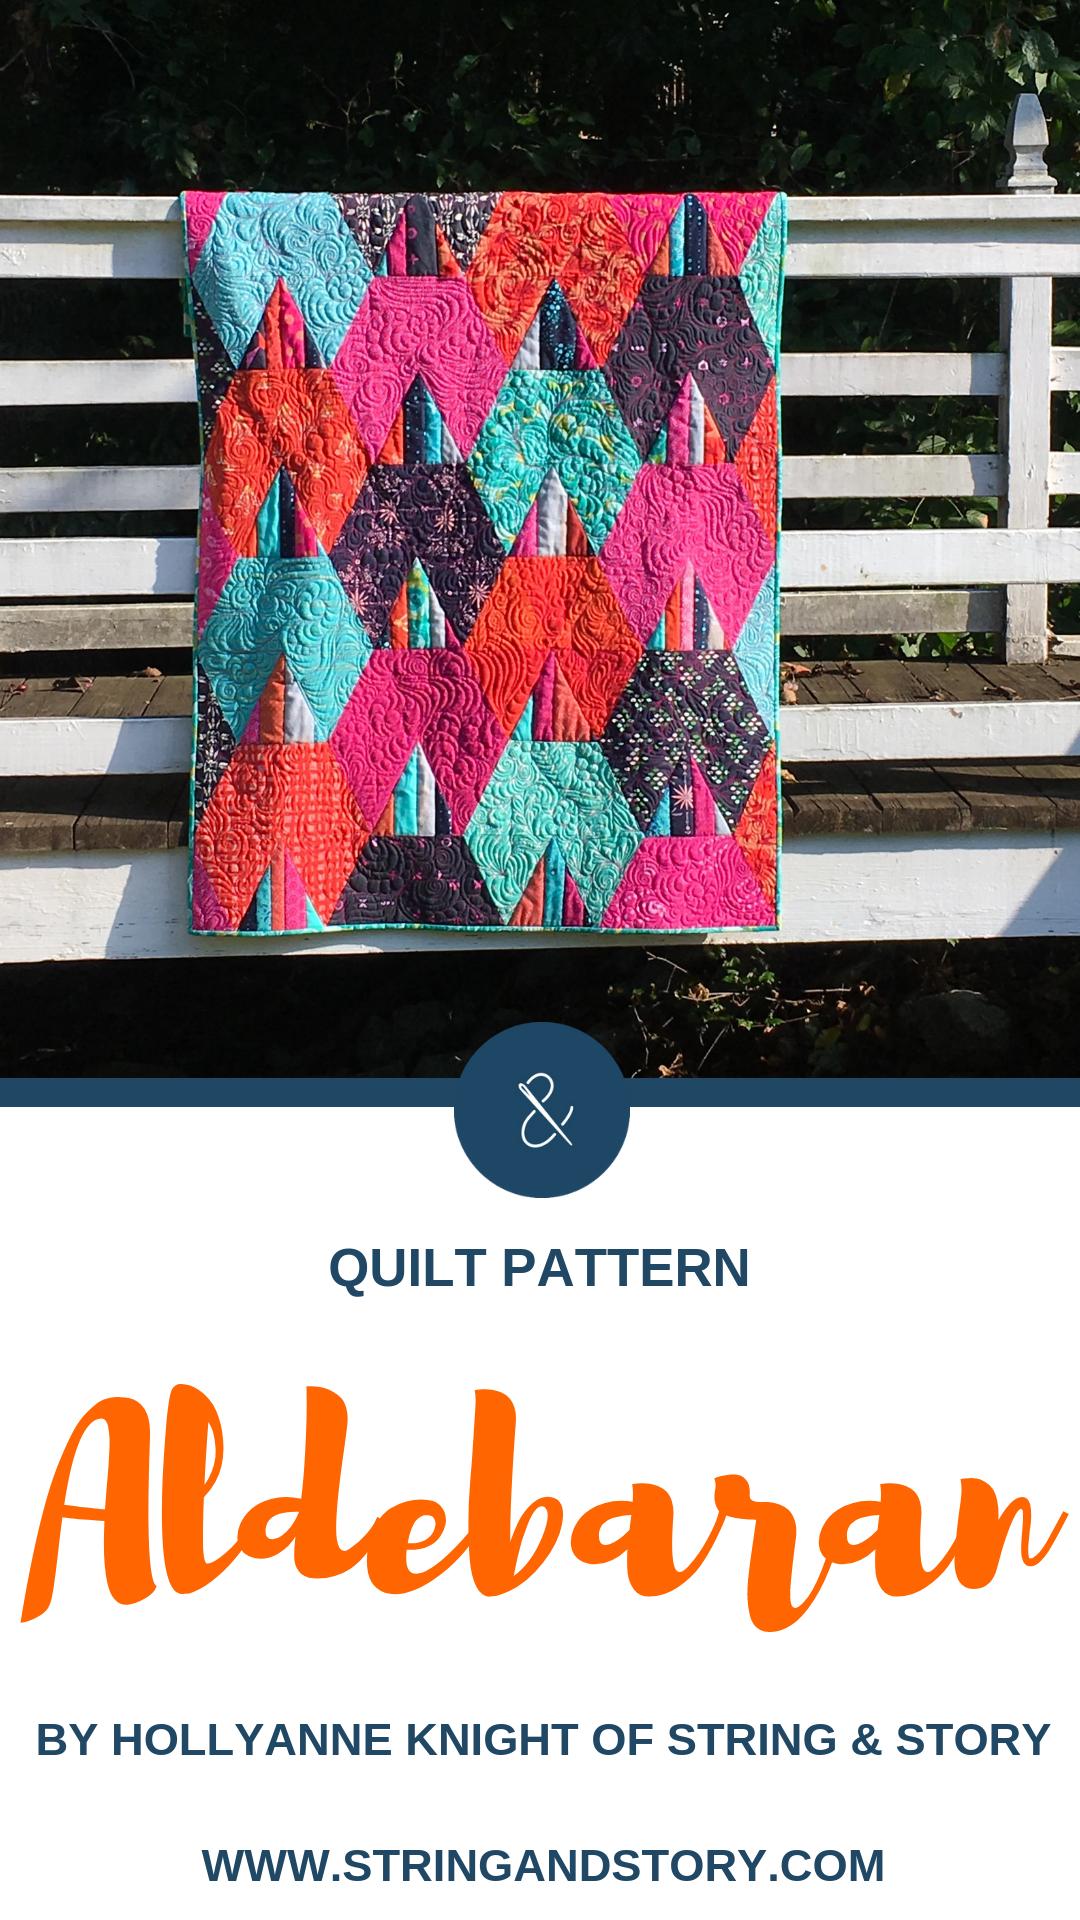 Aldebaran Quilt Pattern by HollyAnne Knight of String & Story